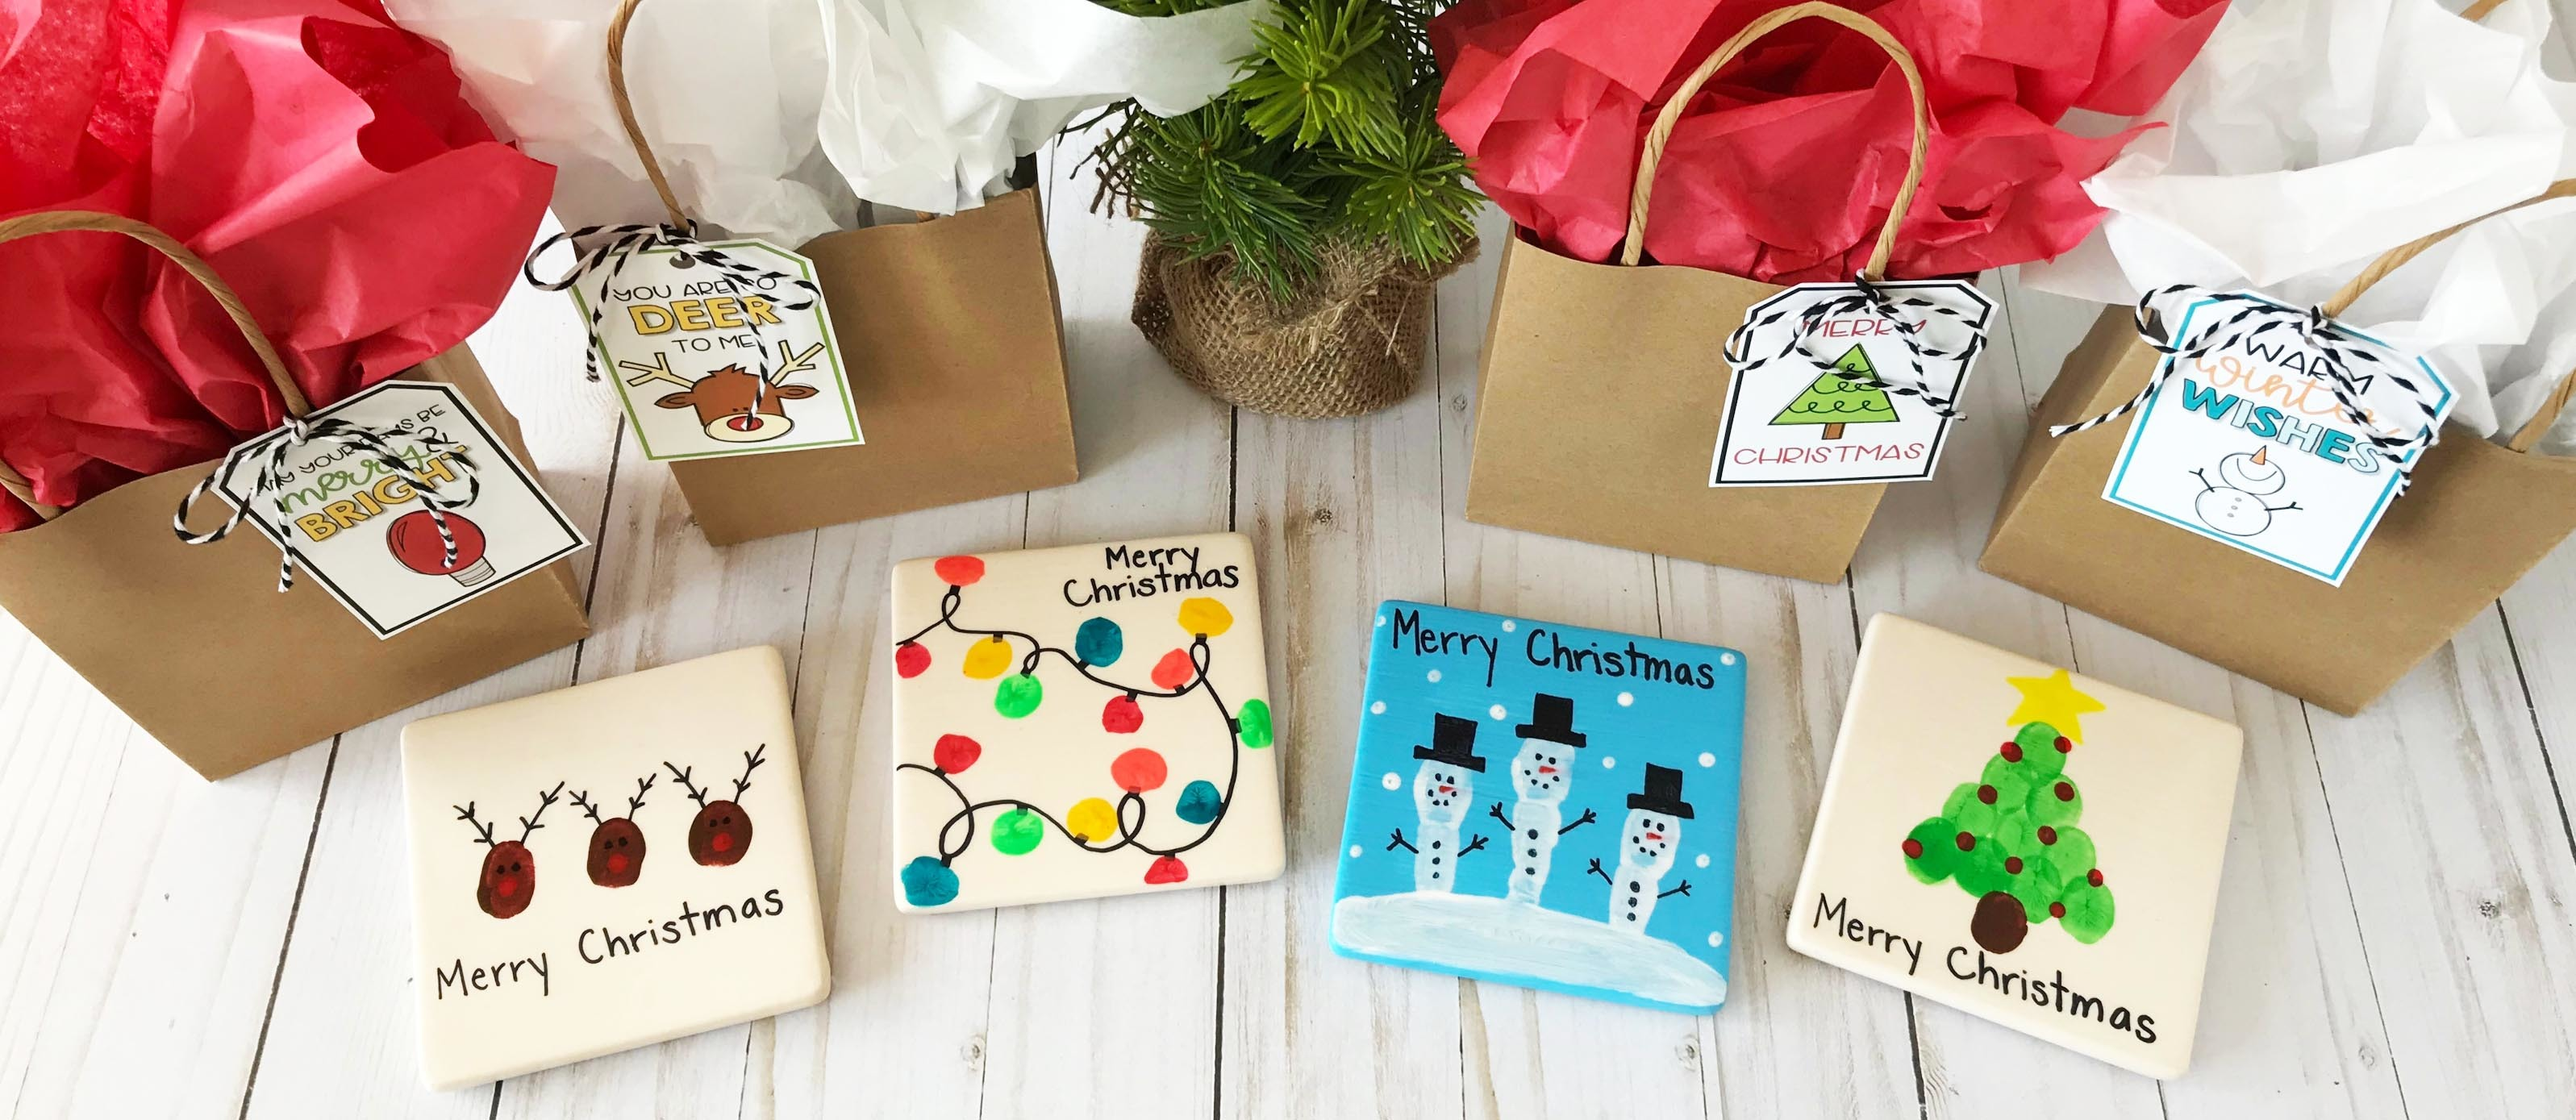 4 Christmas Fingerprint Coasters Free Gift Tags Fun365